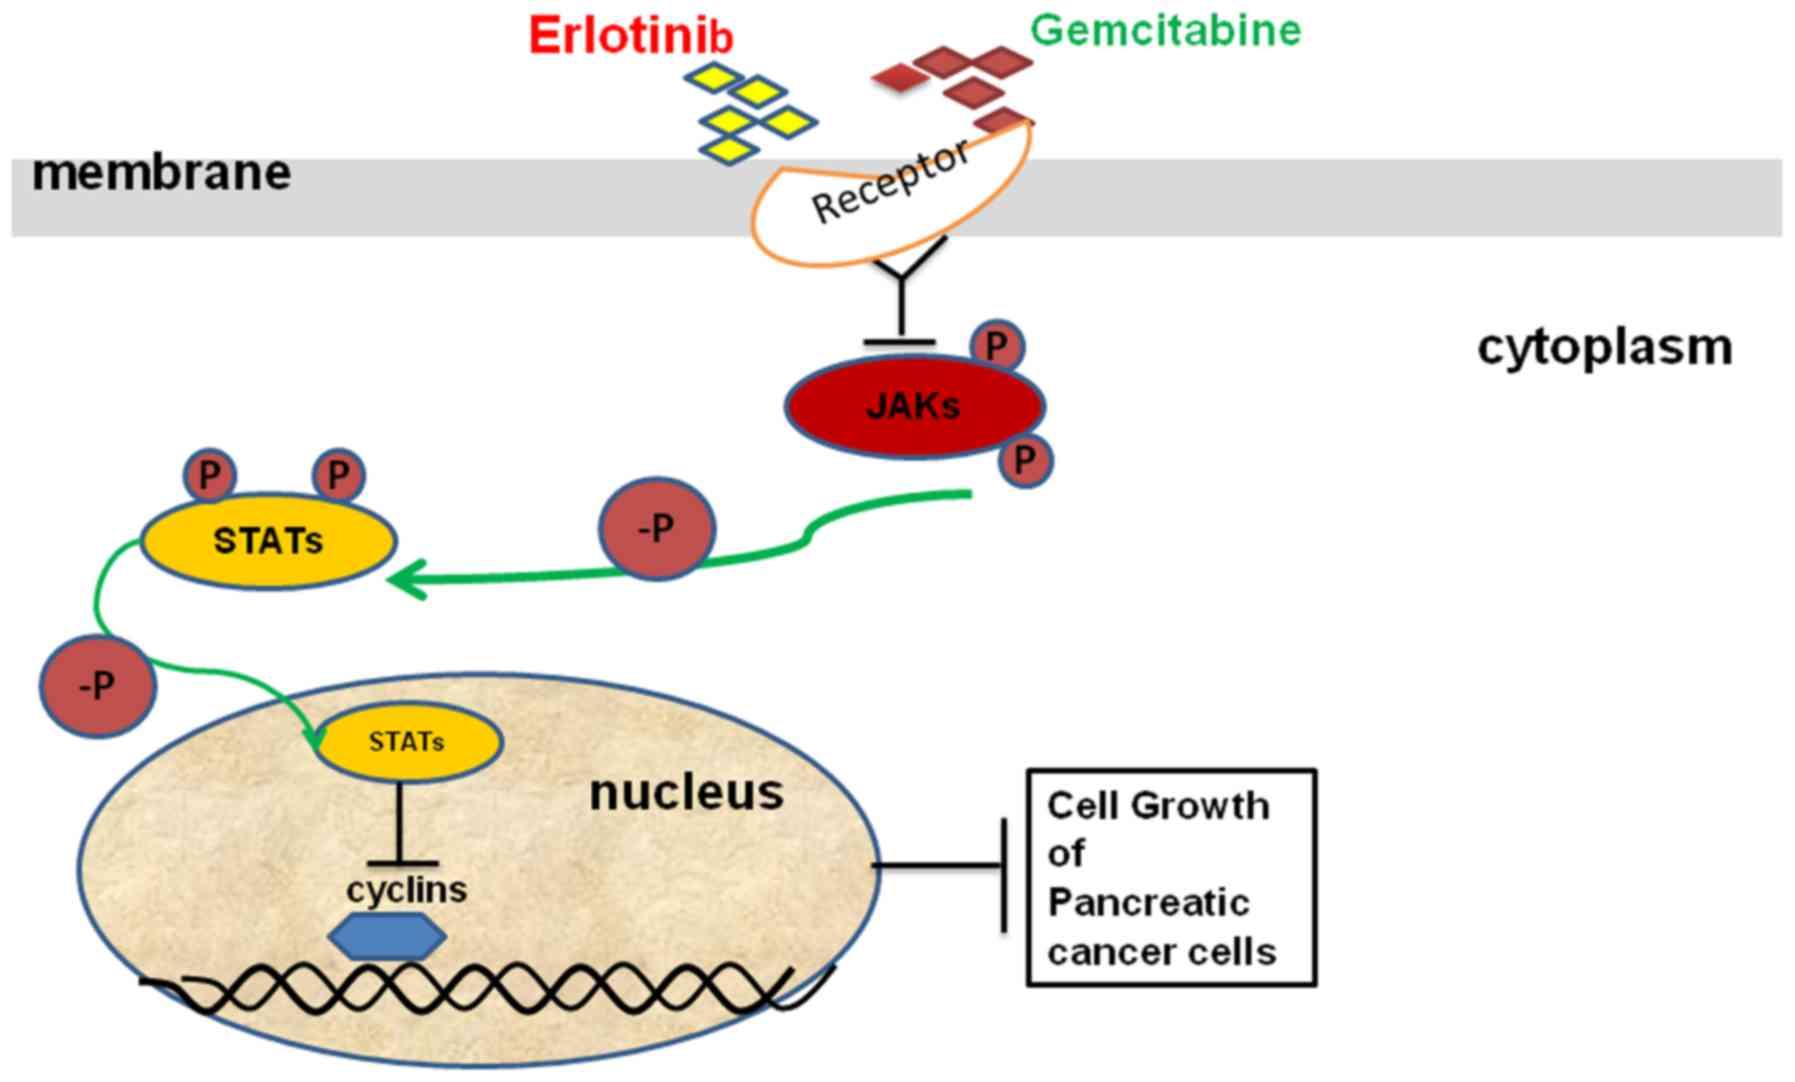 pancreatic cancer erlotinib